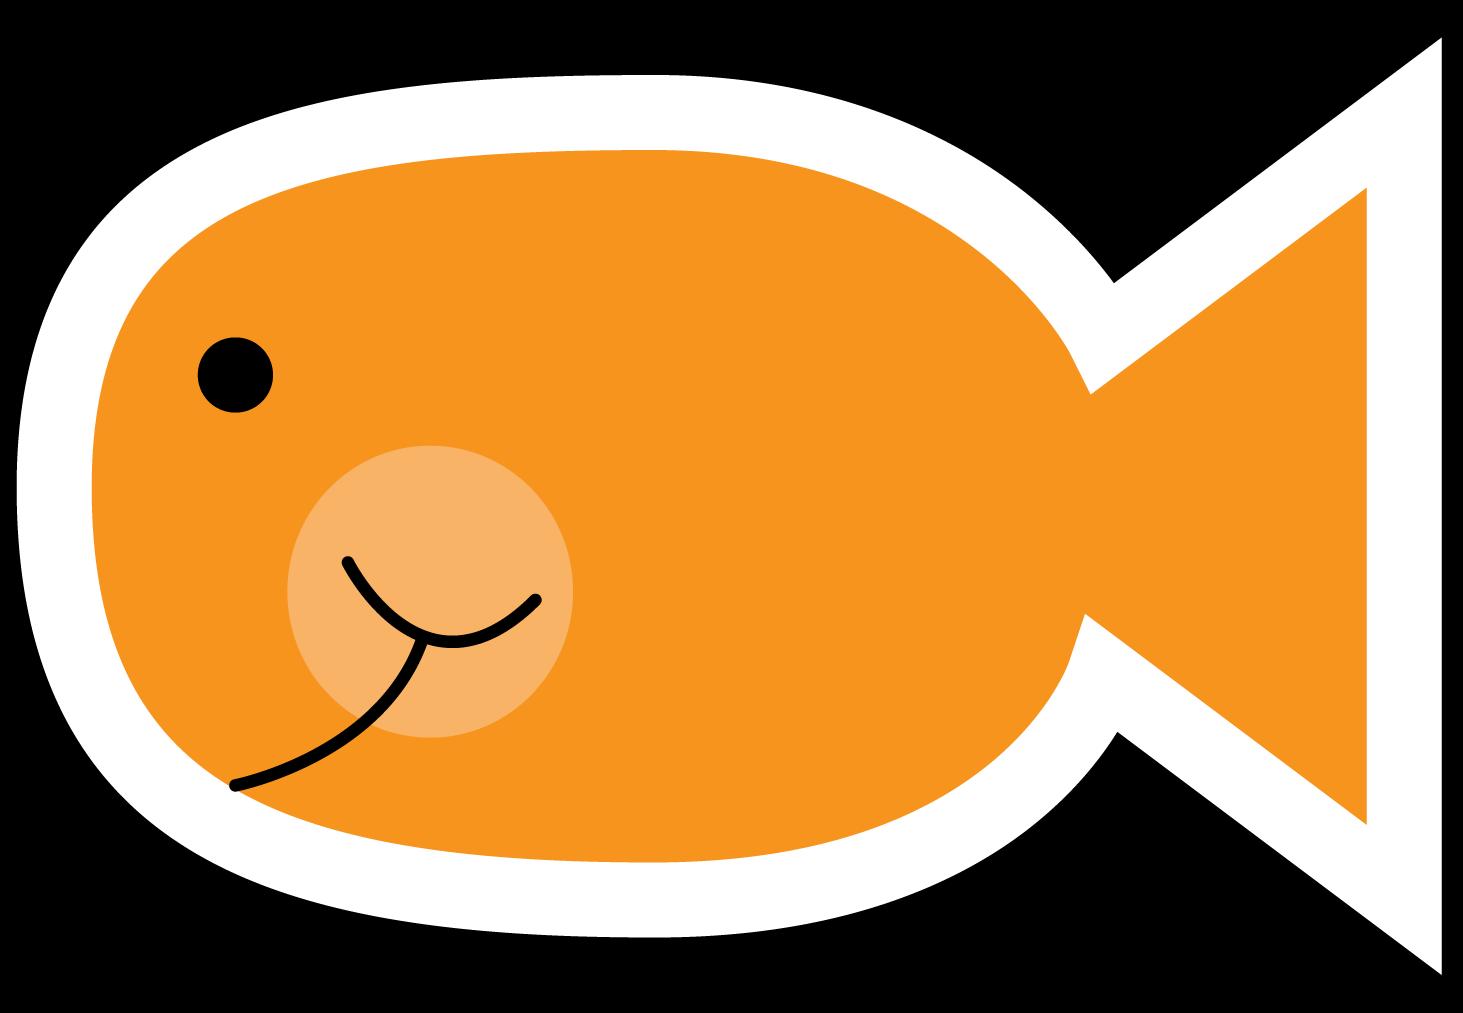 goldfish clipart-goldfish clipart-11